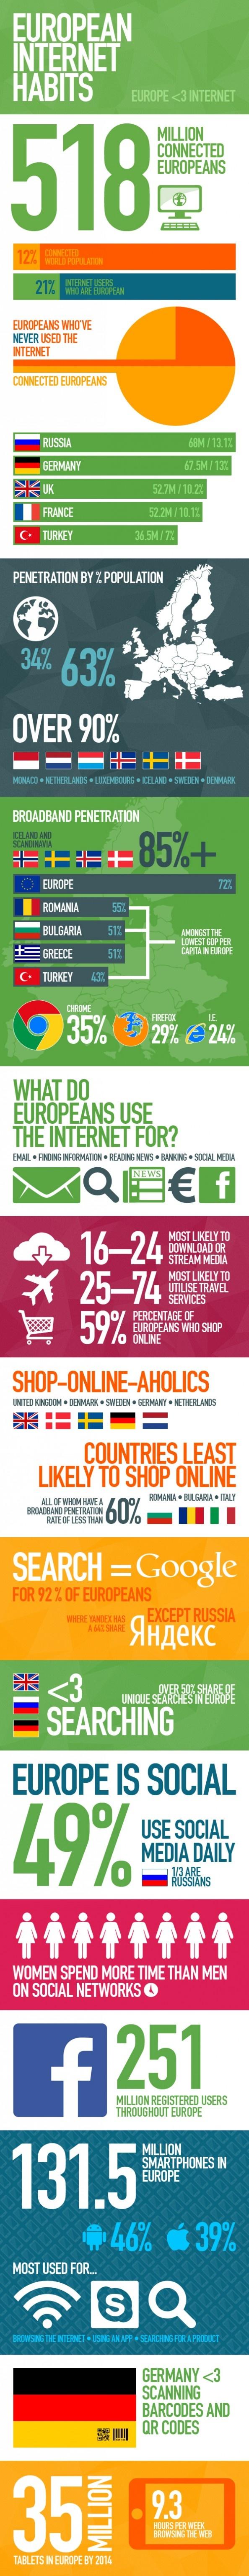 European internet habits Infographic